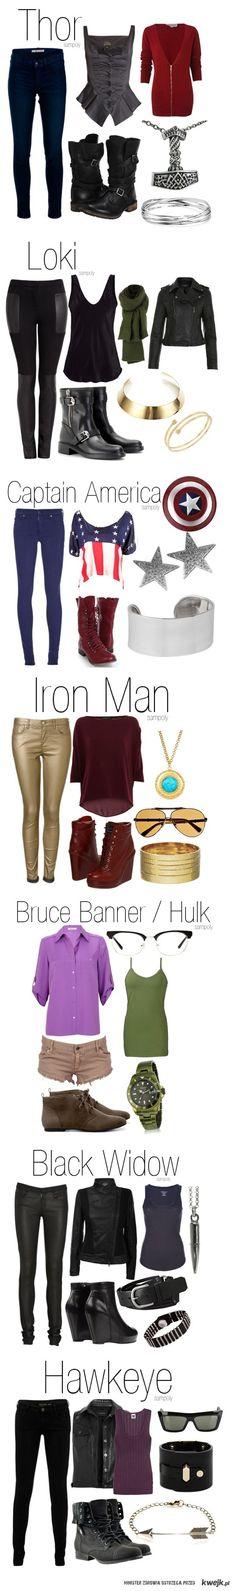 Thor-sweater,boots     Loki-all clothes     Bruce Banner/Hulk- purple shirt     Black Widow- shirt     Hawkeye- all, especially boots